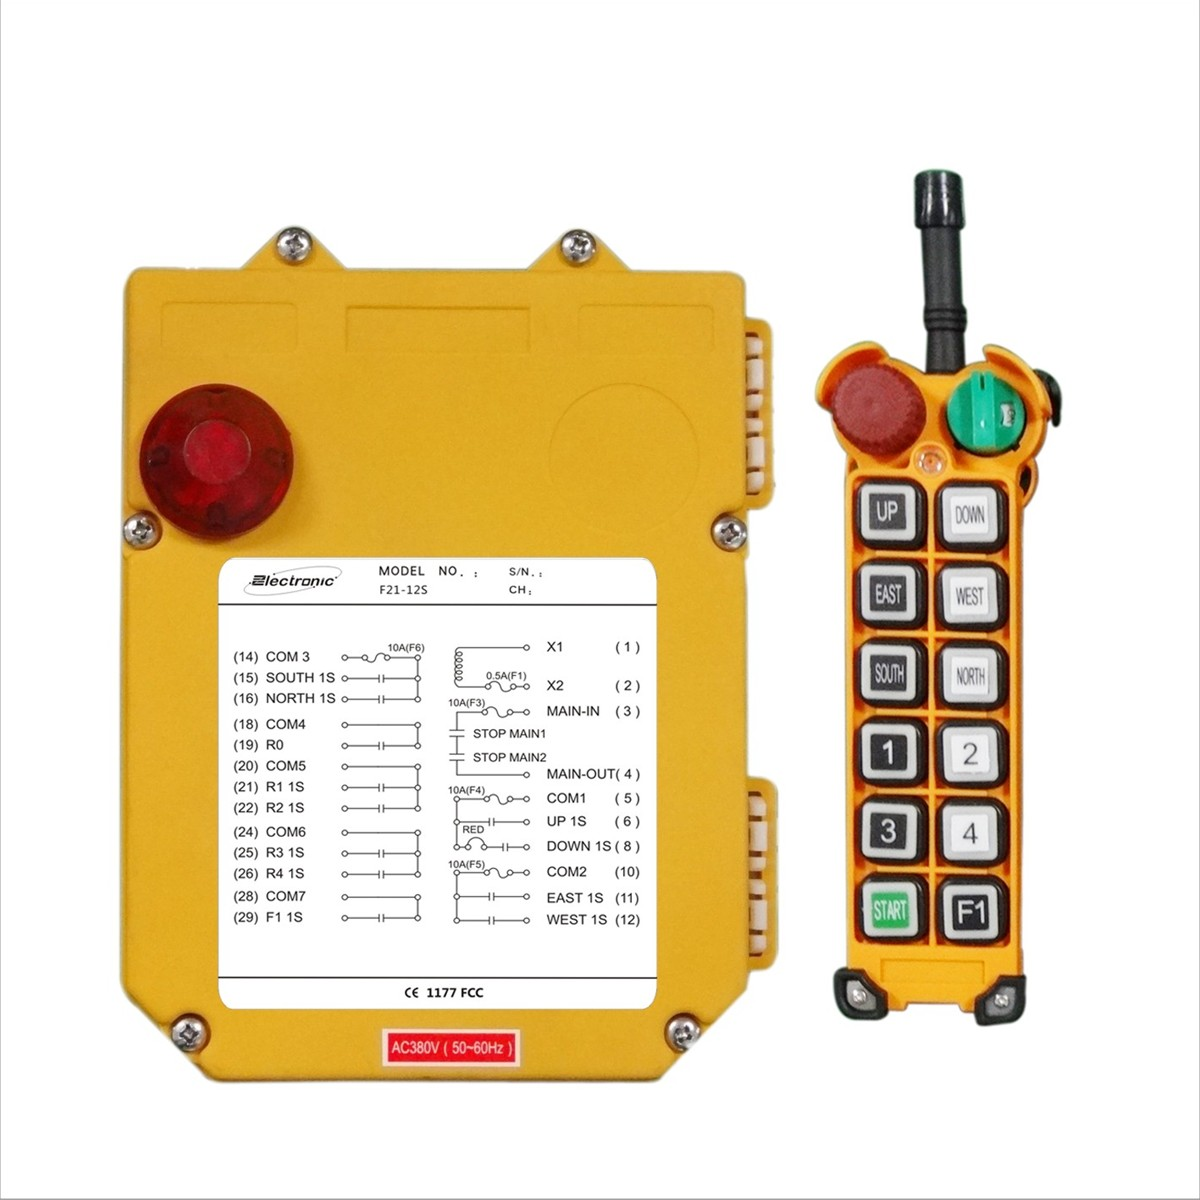 Overhead Crane Remote Control : F s single speed wireless industrial radio crane